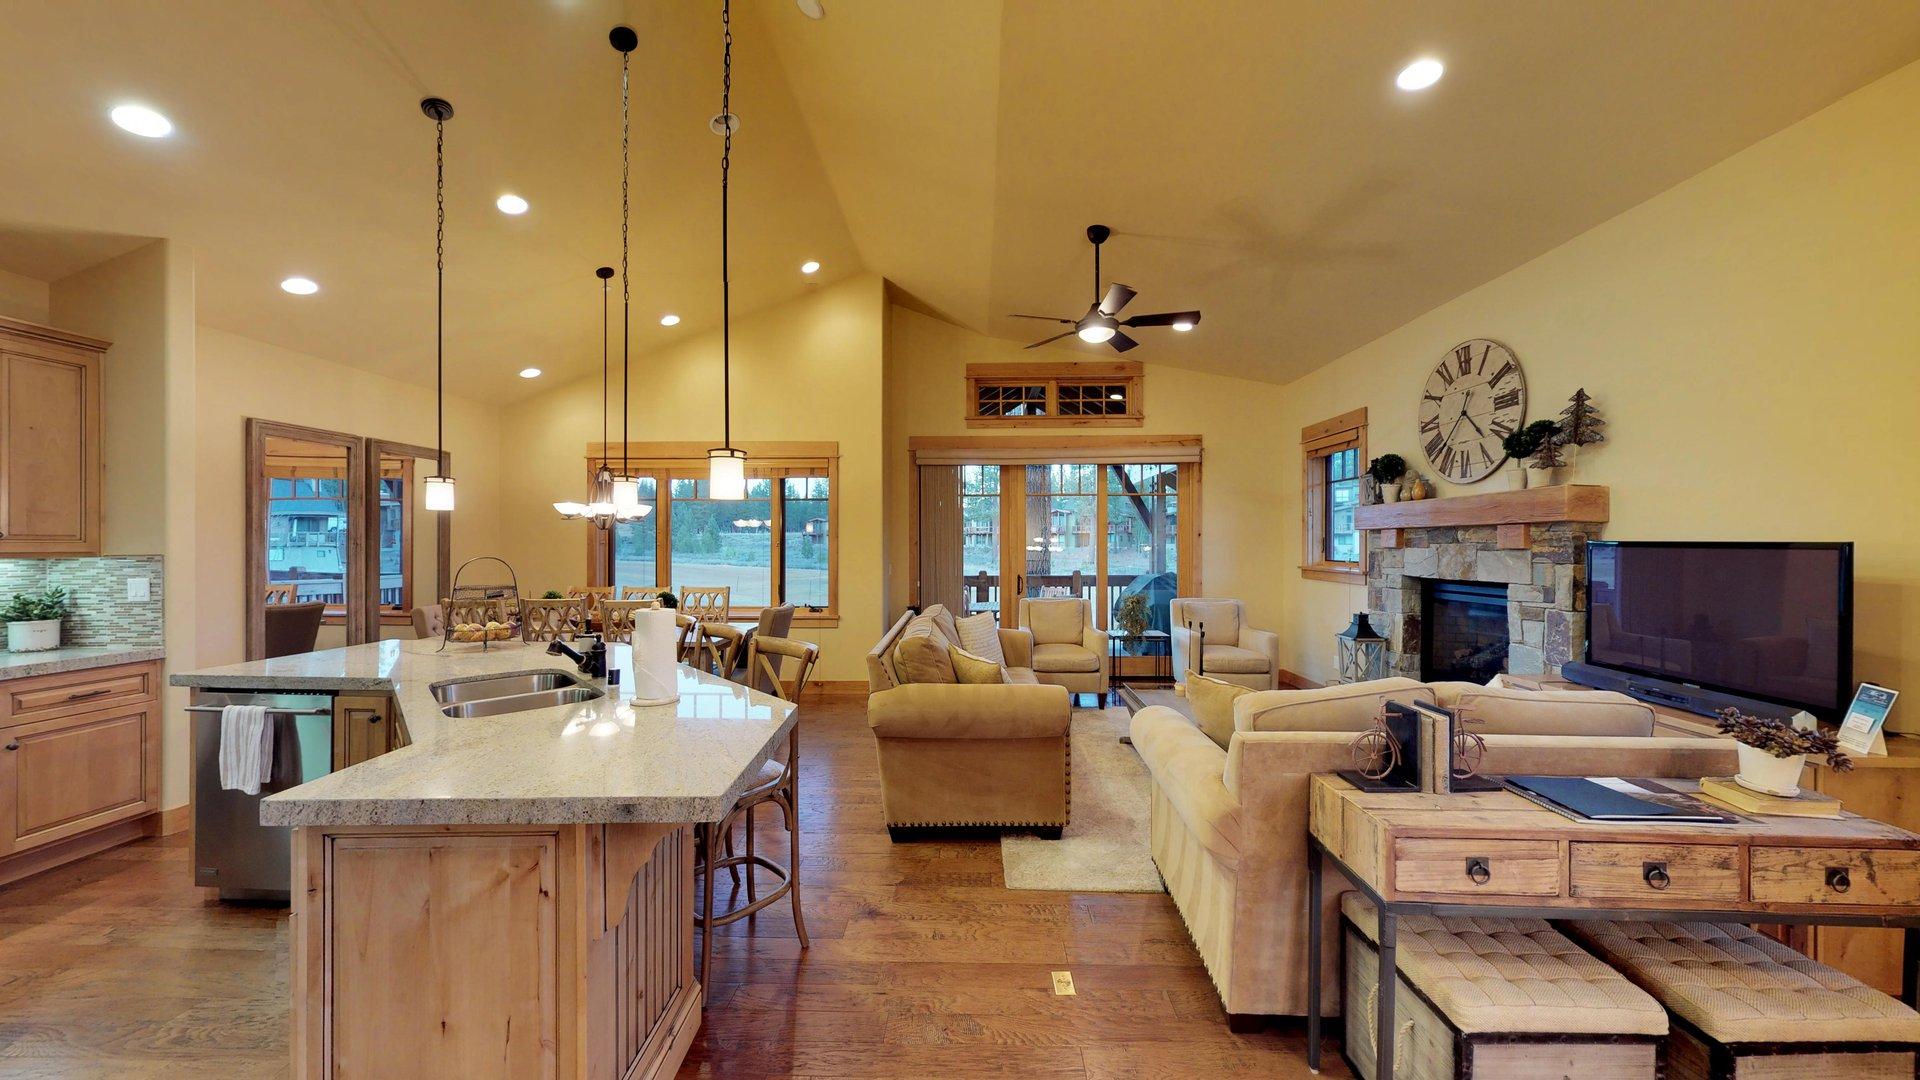 Spacious Open-Floor Plan in Our Vacation Rental in Truckee CA.